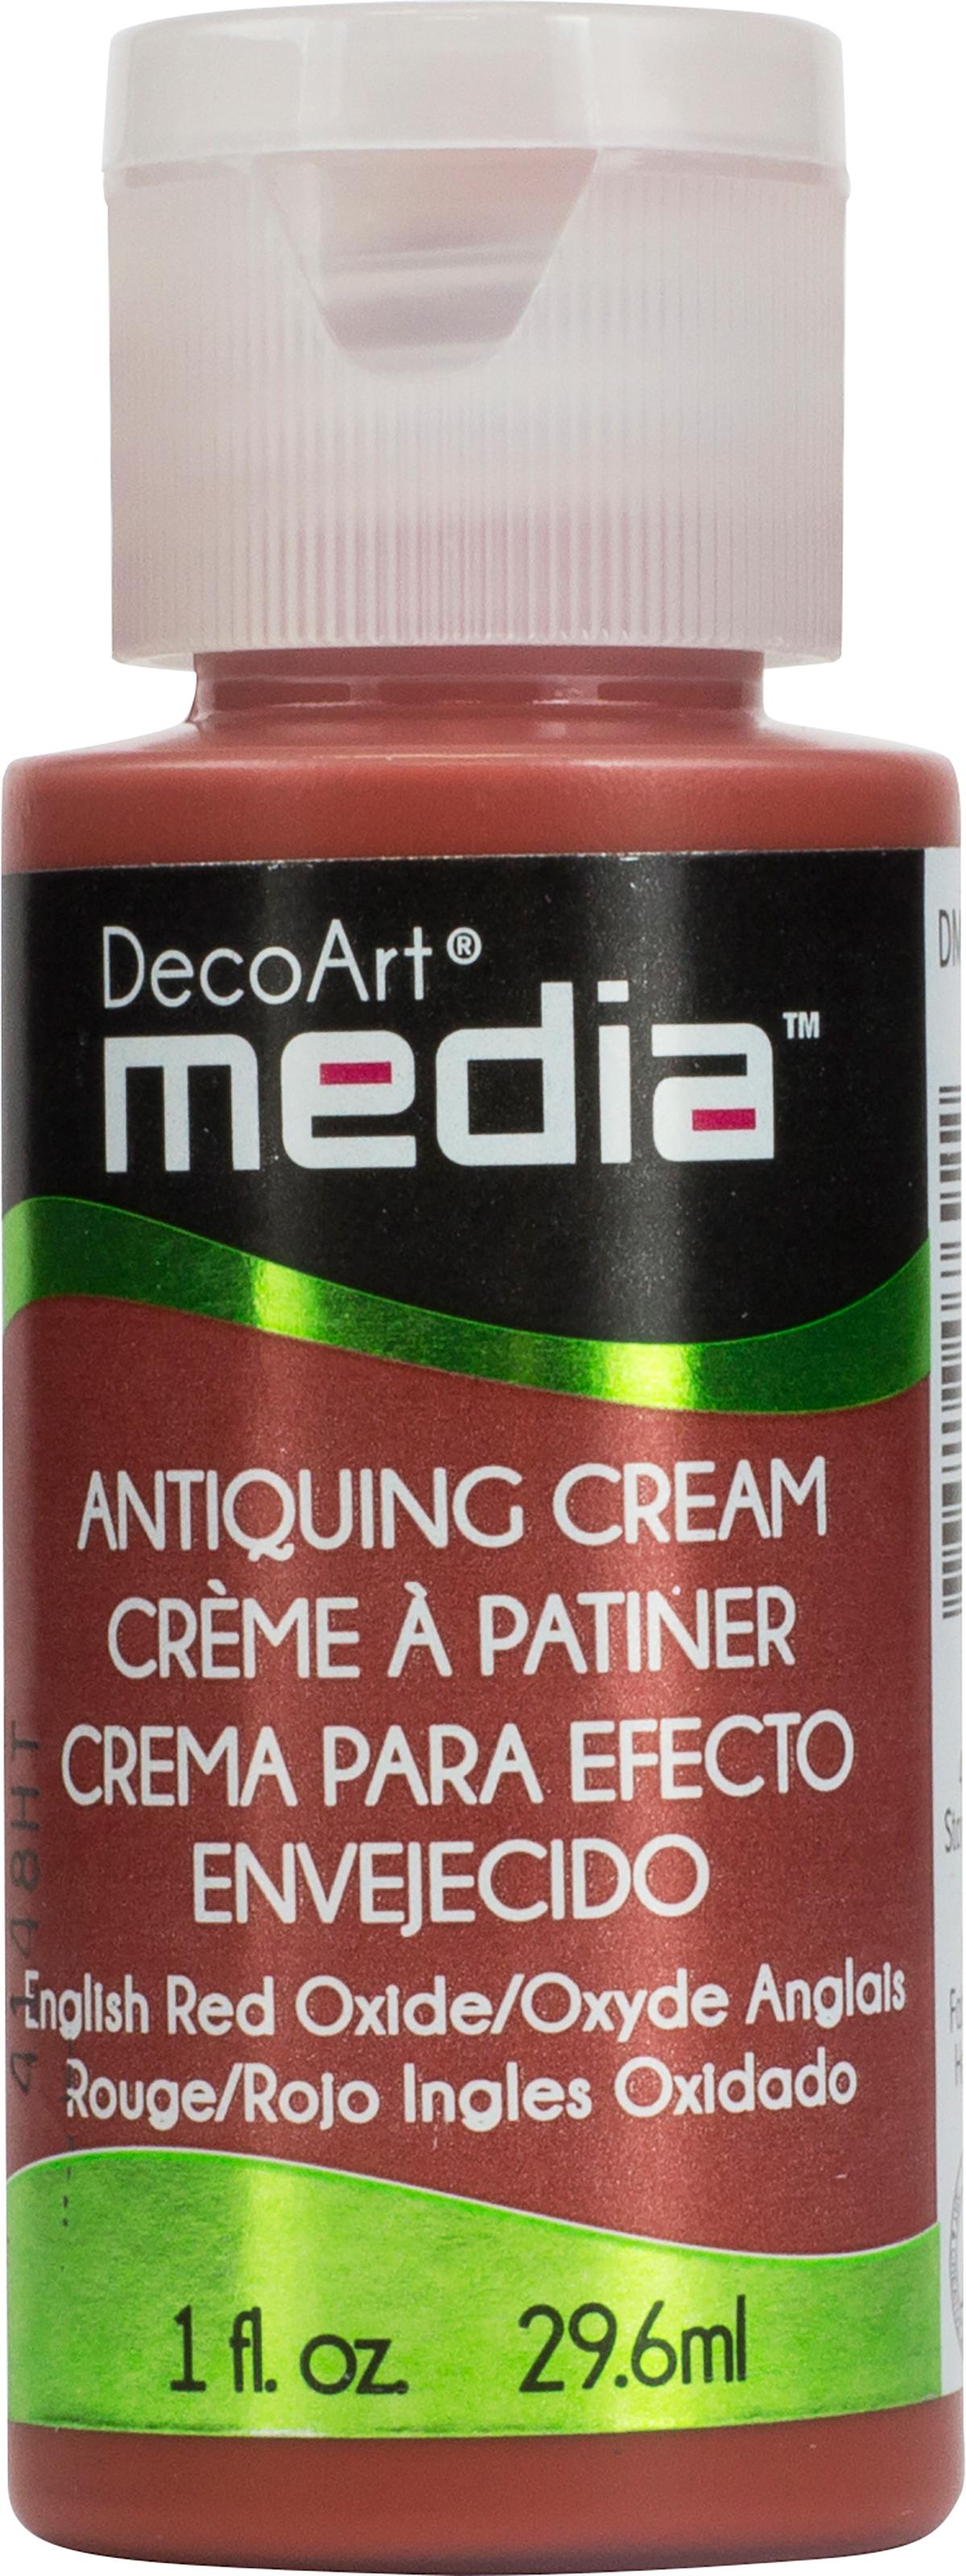 DecoArt - Media Antiquing Cream - Red Oxide